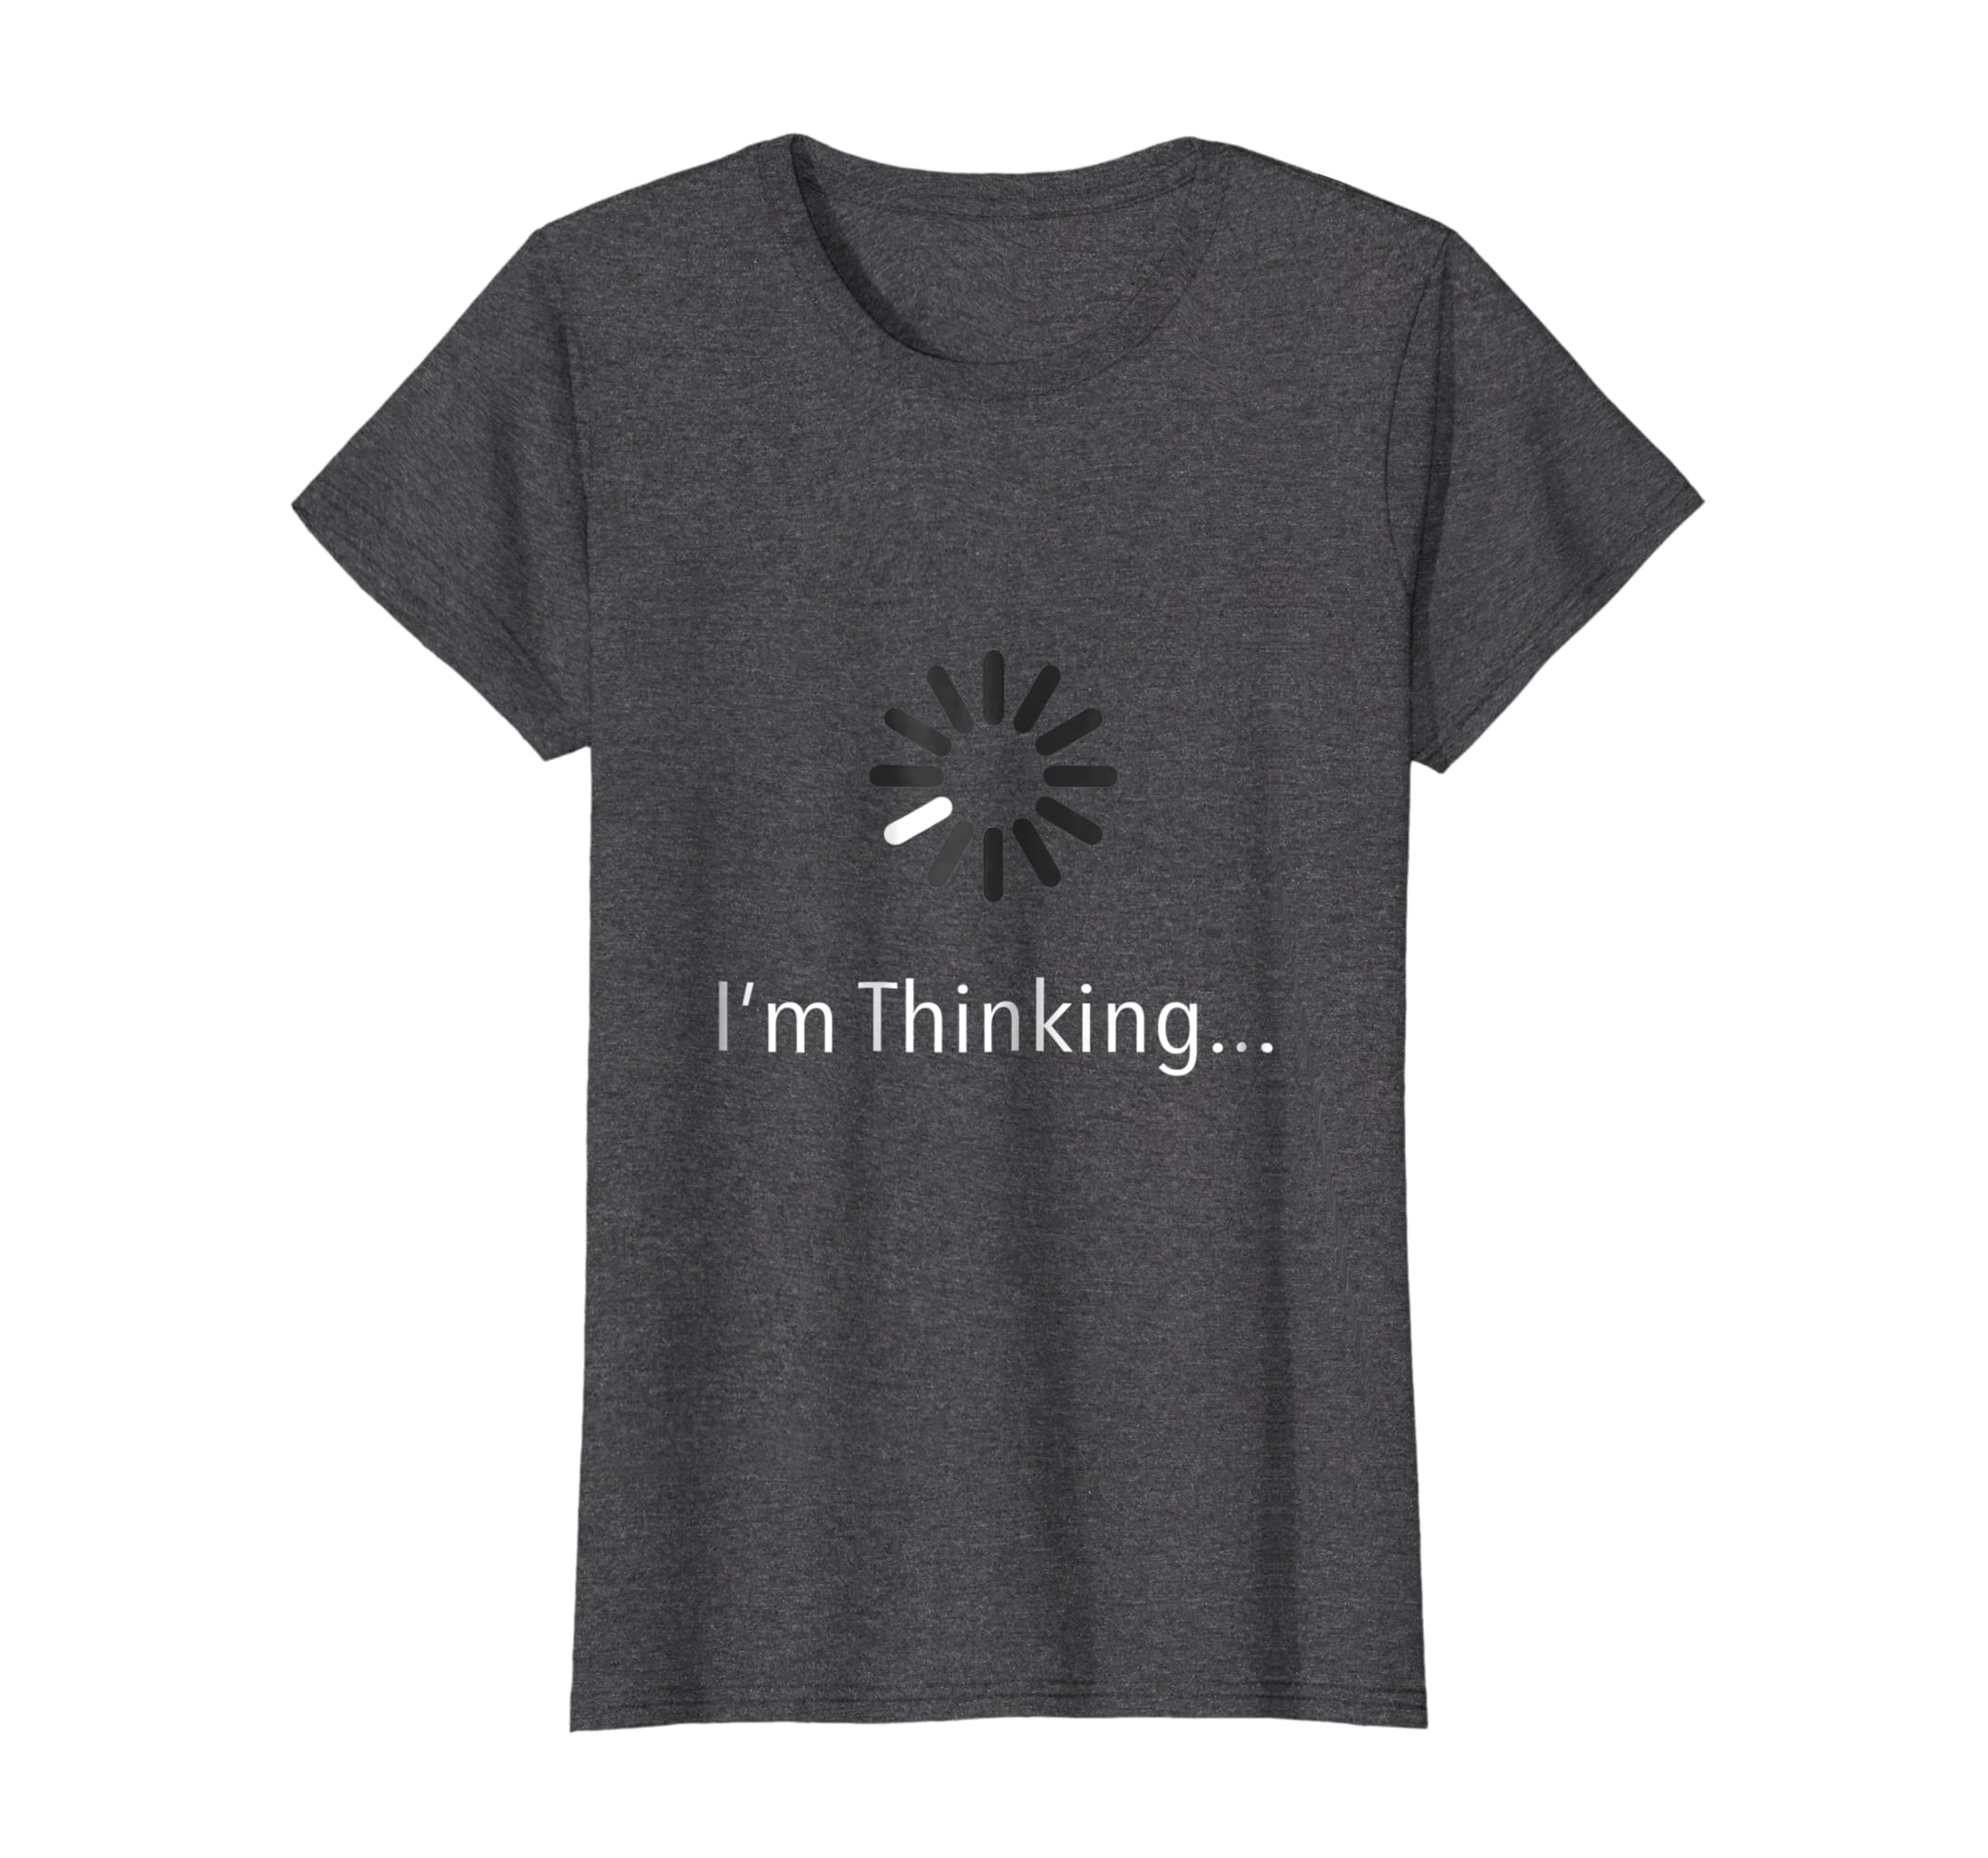 8495de14f Amazon.com: Geek Nerd Computer Programmer Techie Shirt Gift Sarcasm:  Clothing